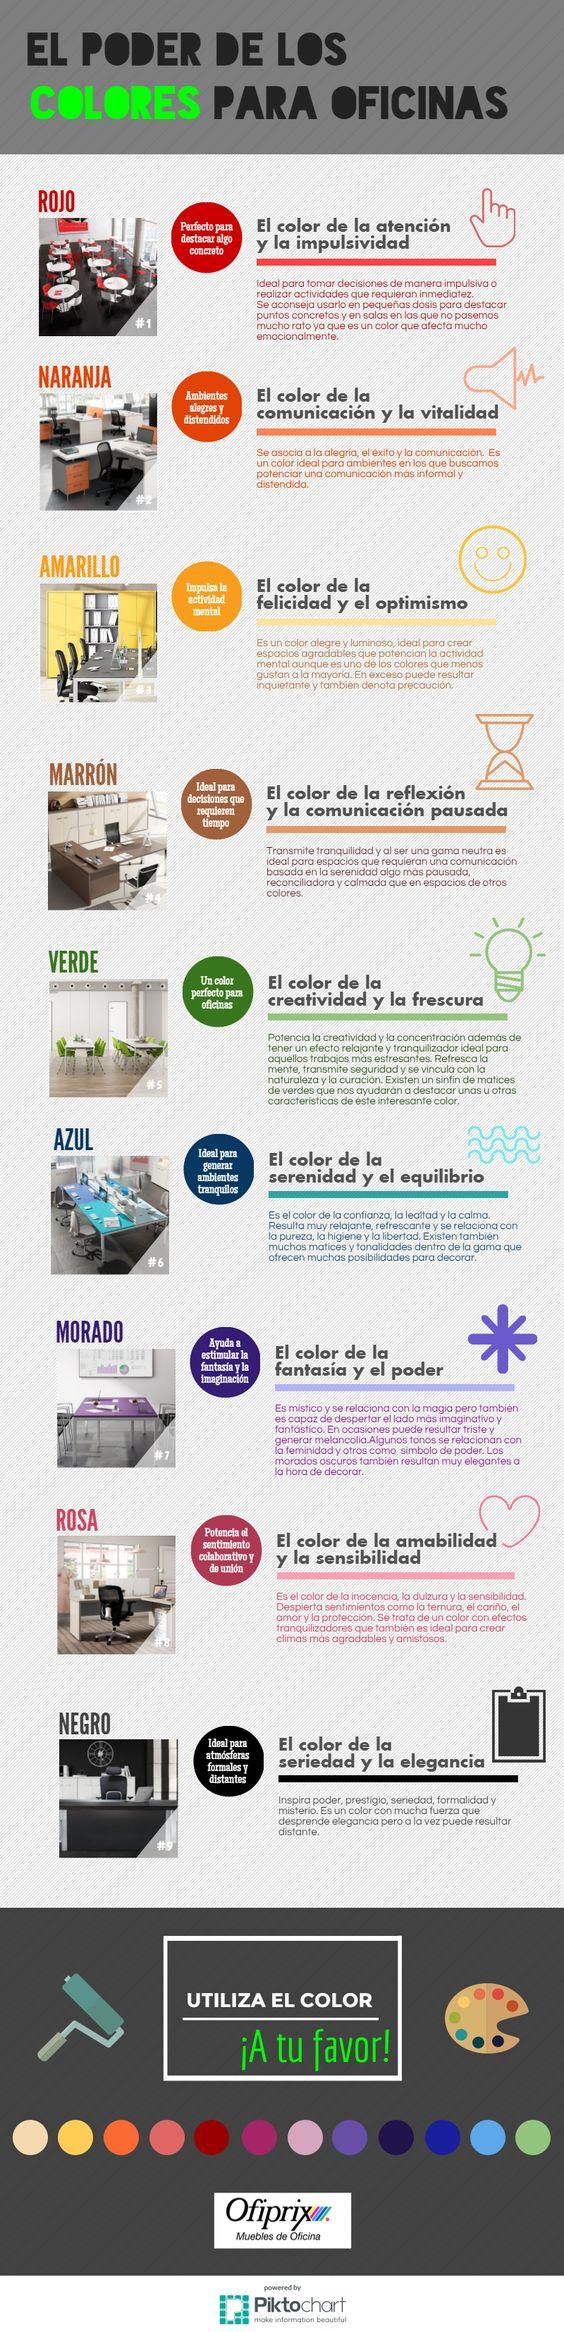 Infografia. Colores para oficina OFIPRIX